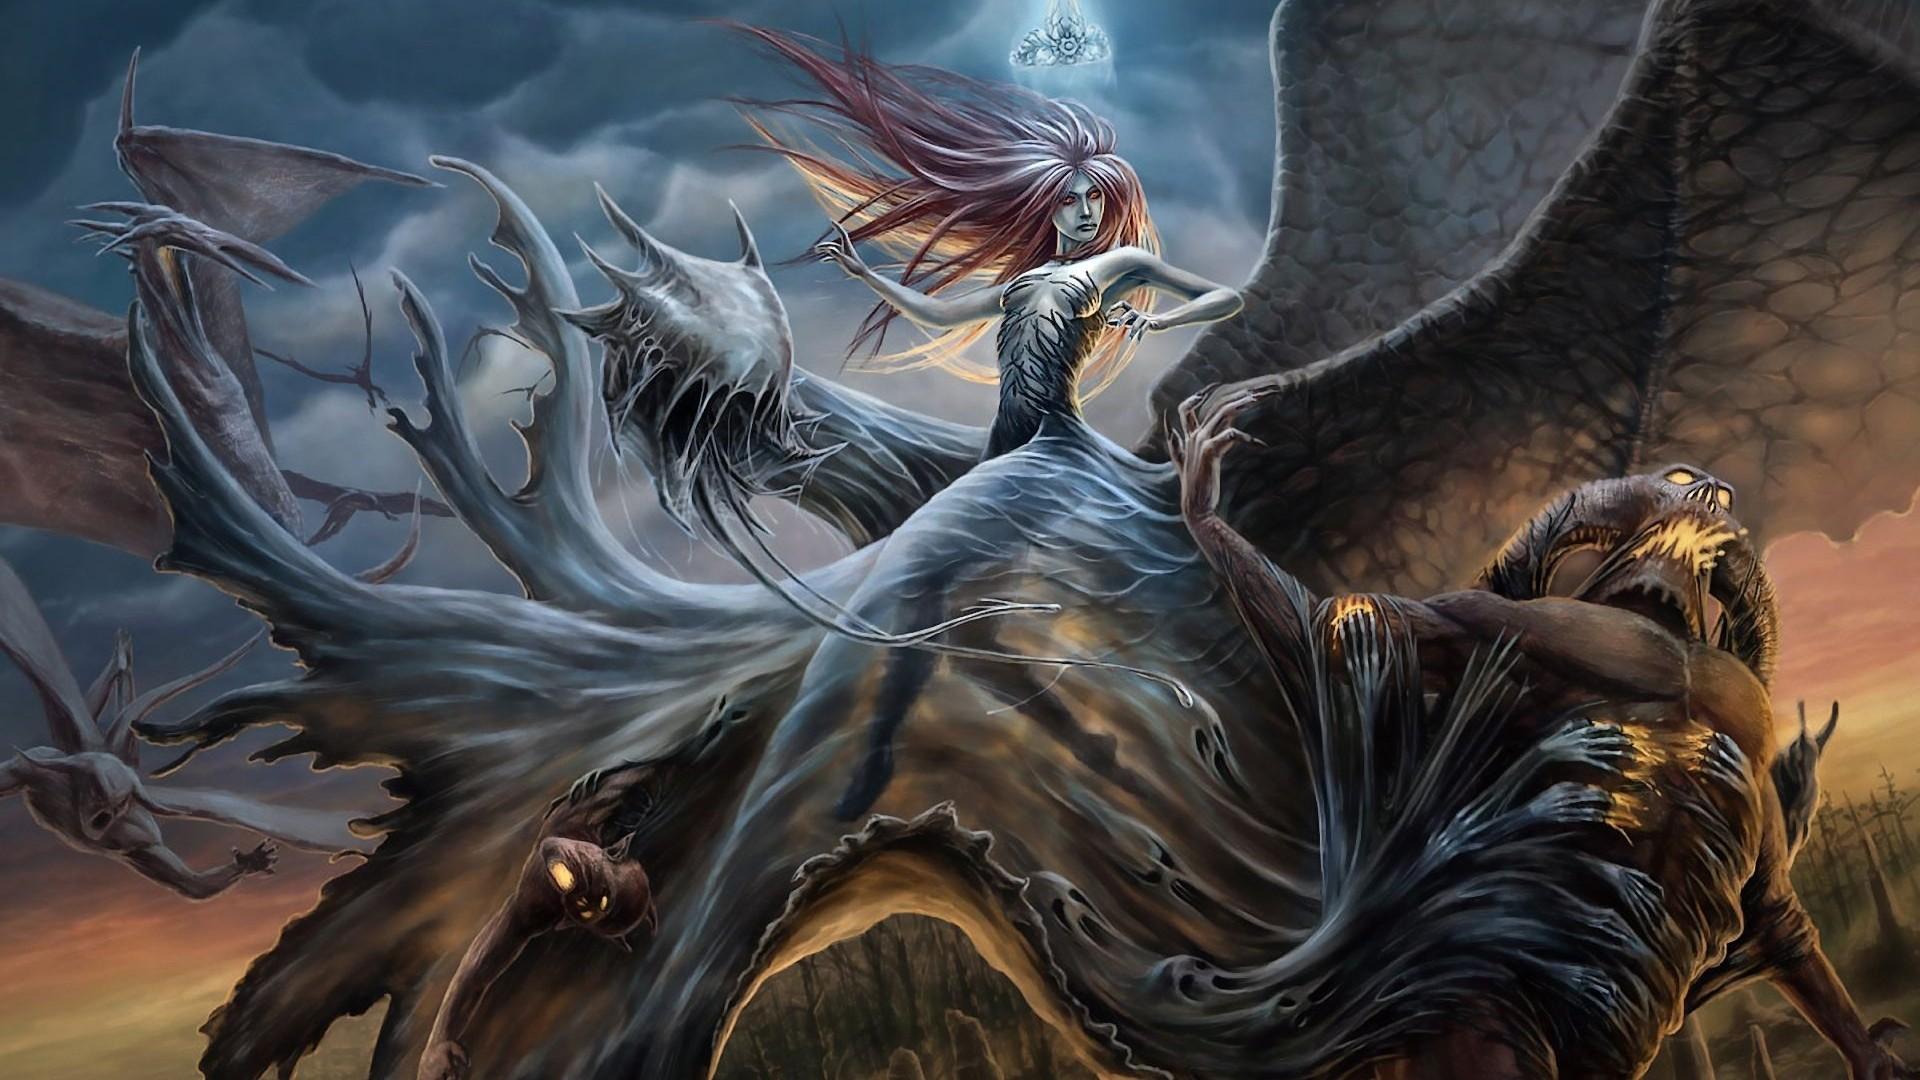 Fantasy art creatures wallpaper | 1920x1080 | 188829 ... - photo#27